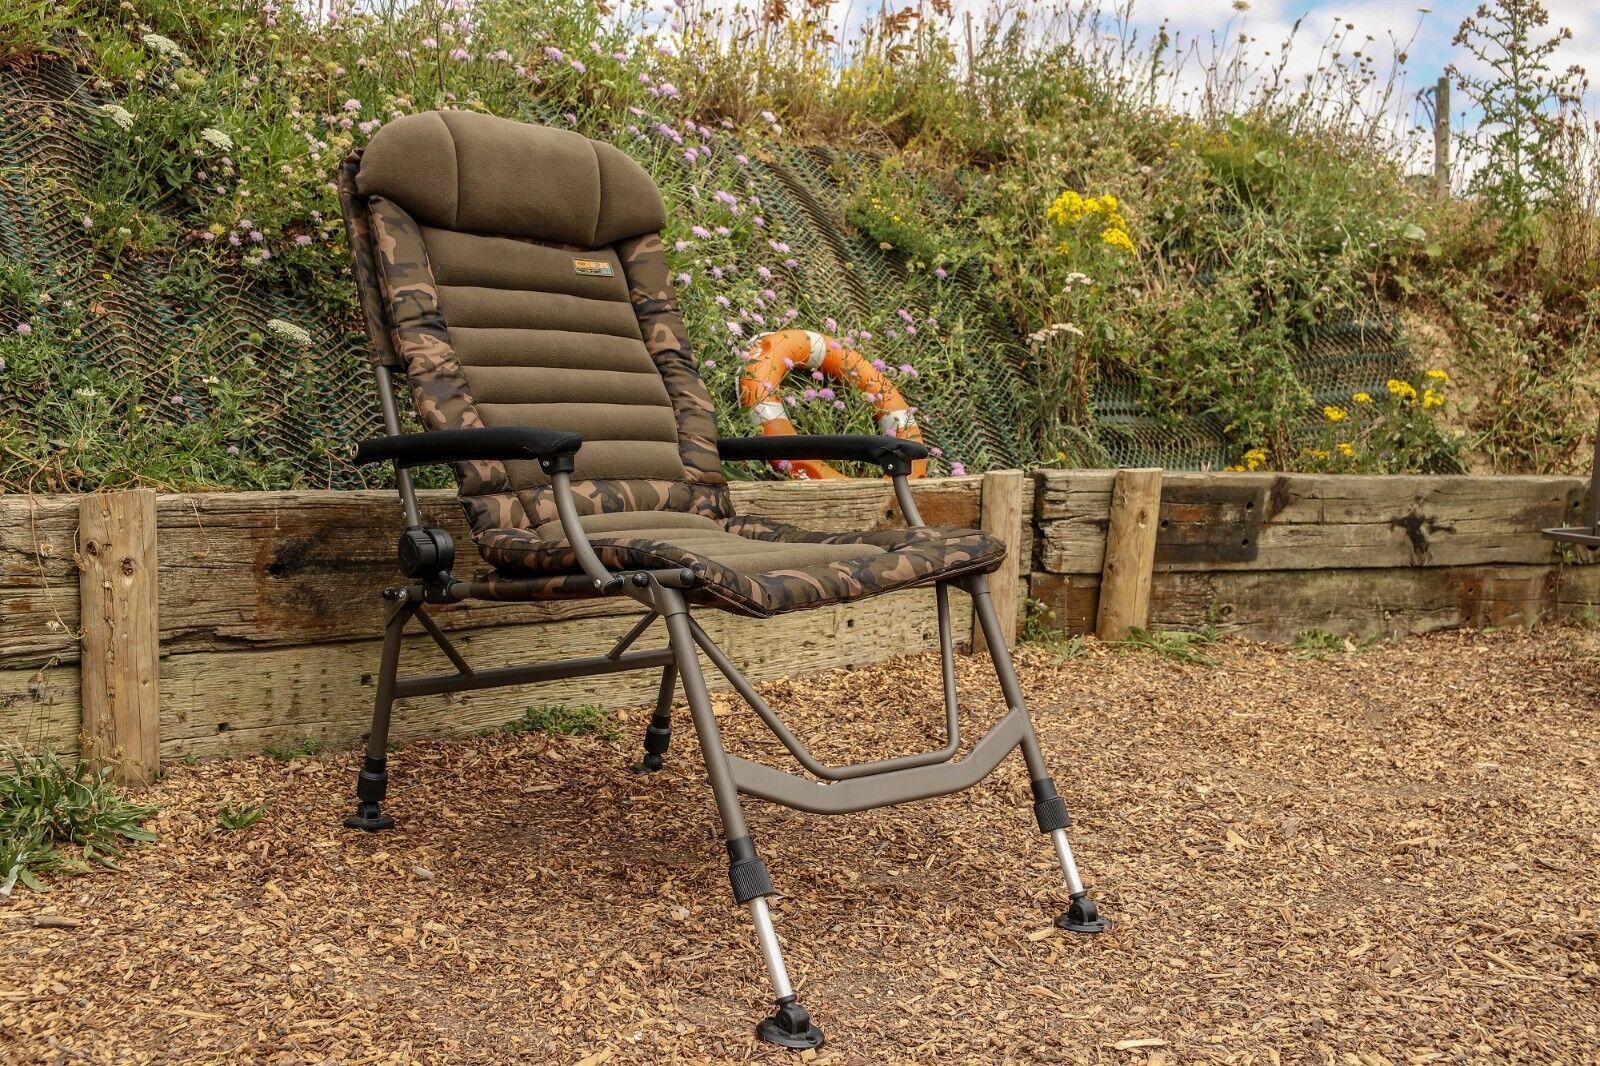 Fox FX Super Deluxe Recliner Chair Camo NEW - CBC078 TT EXCLUSIVE